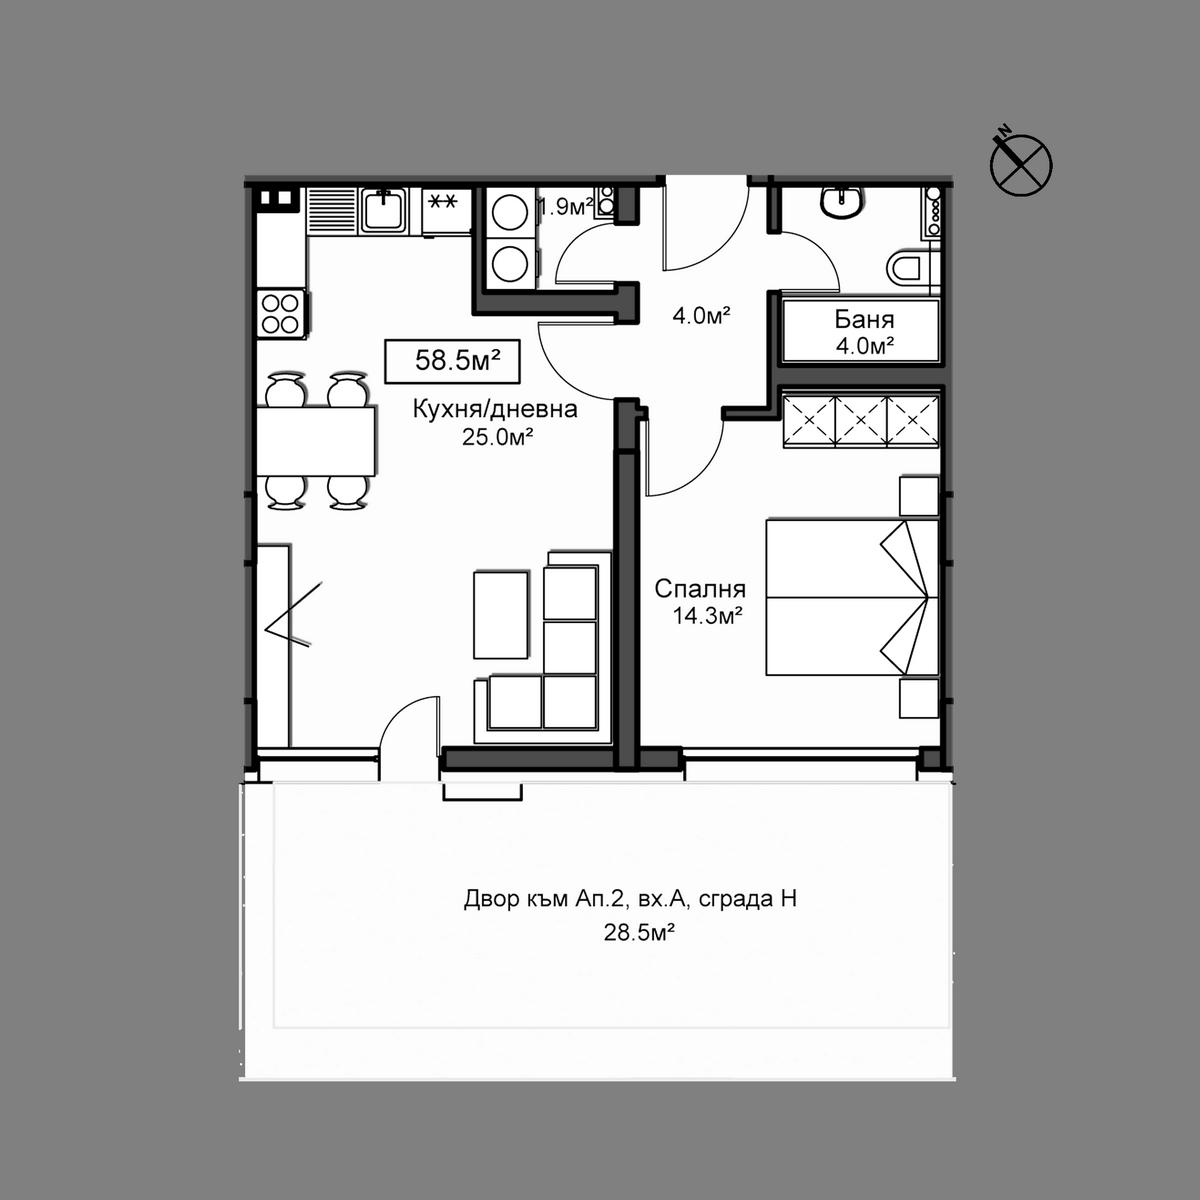 Апартамент А2